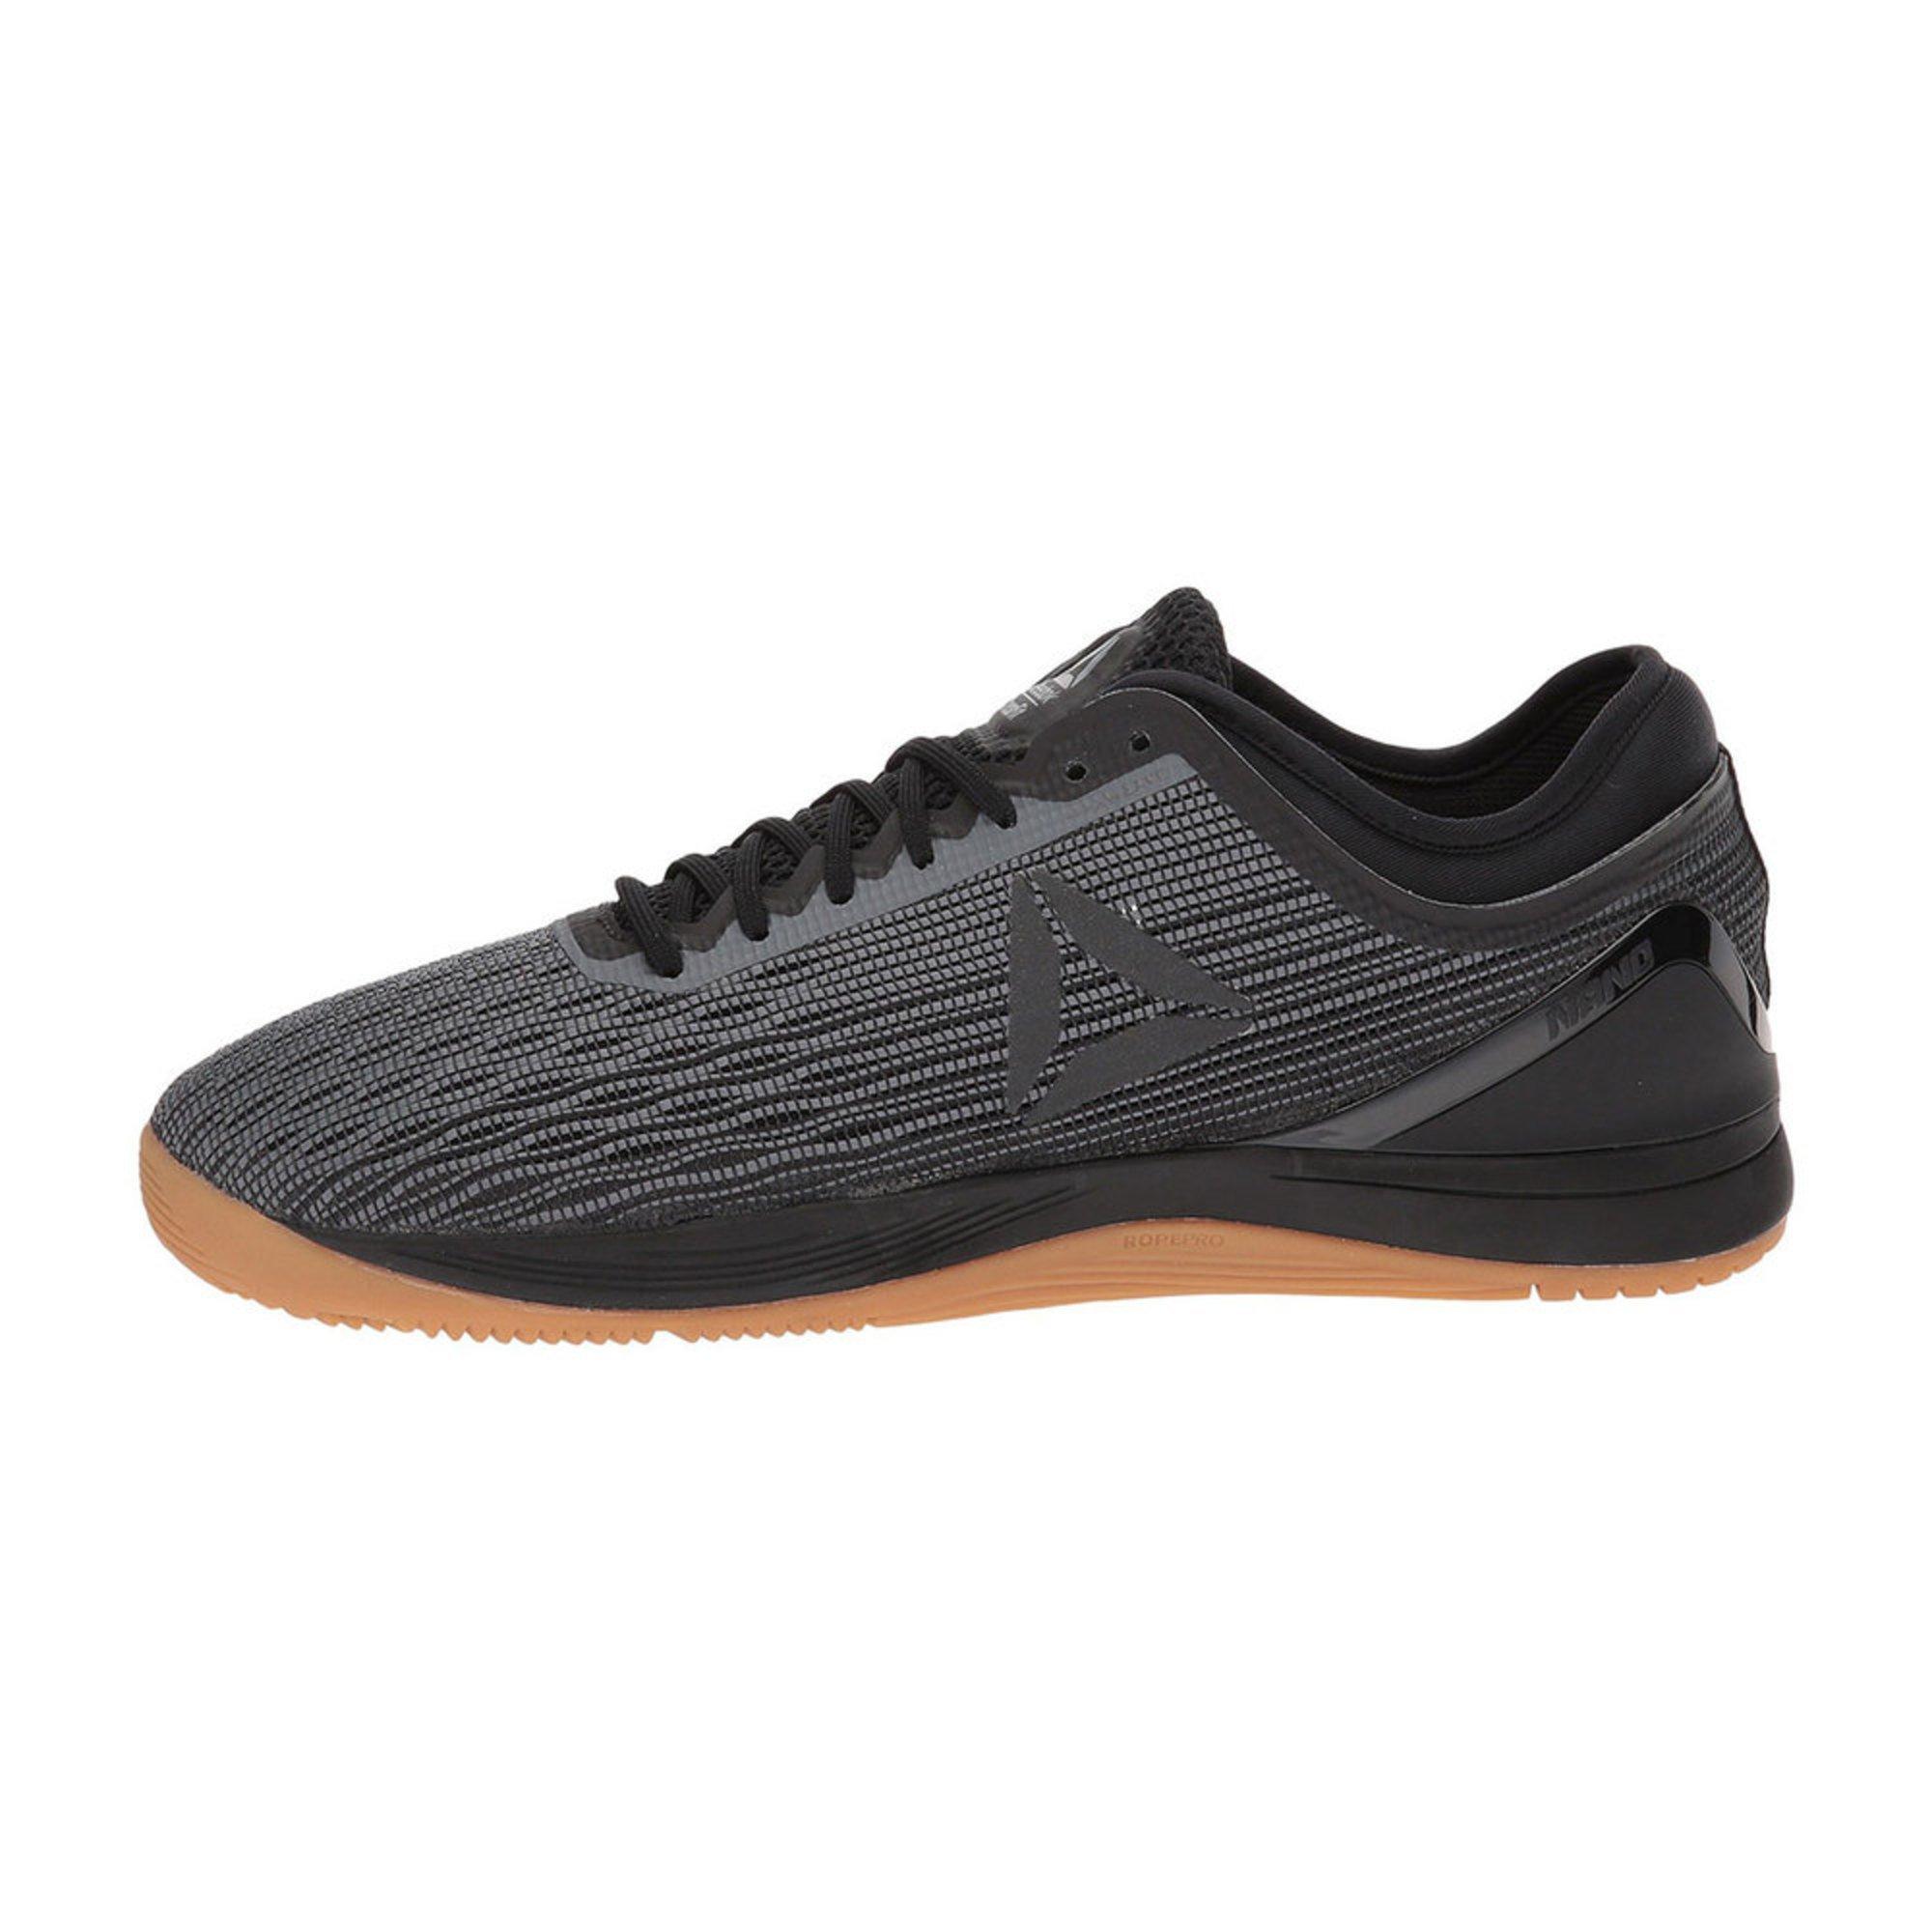 f28dc82cb36d Reebok Men s Crossfit Nano 8.0 Crossfit Training Shoe